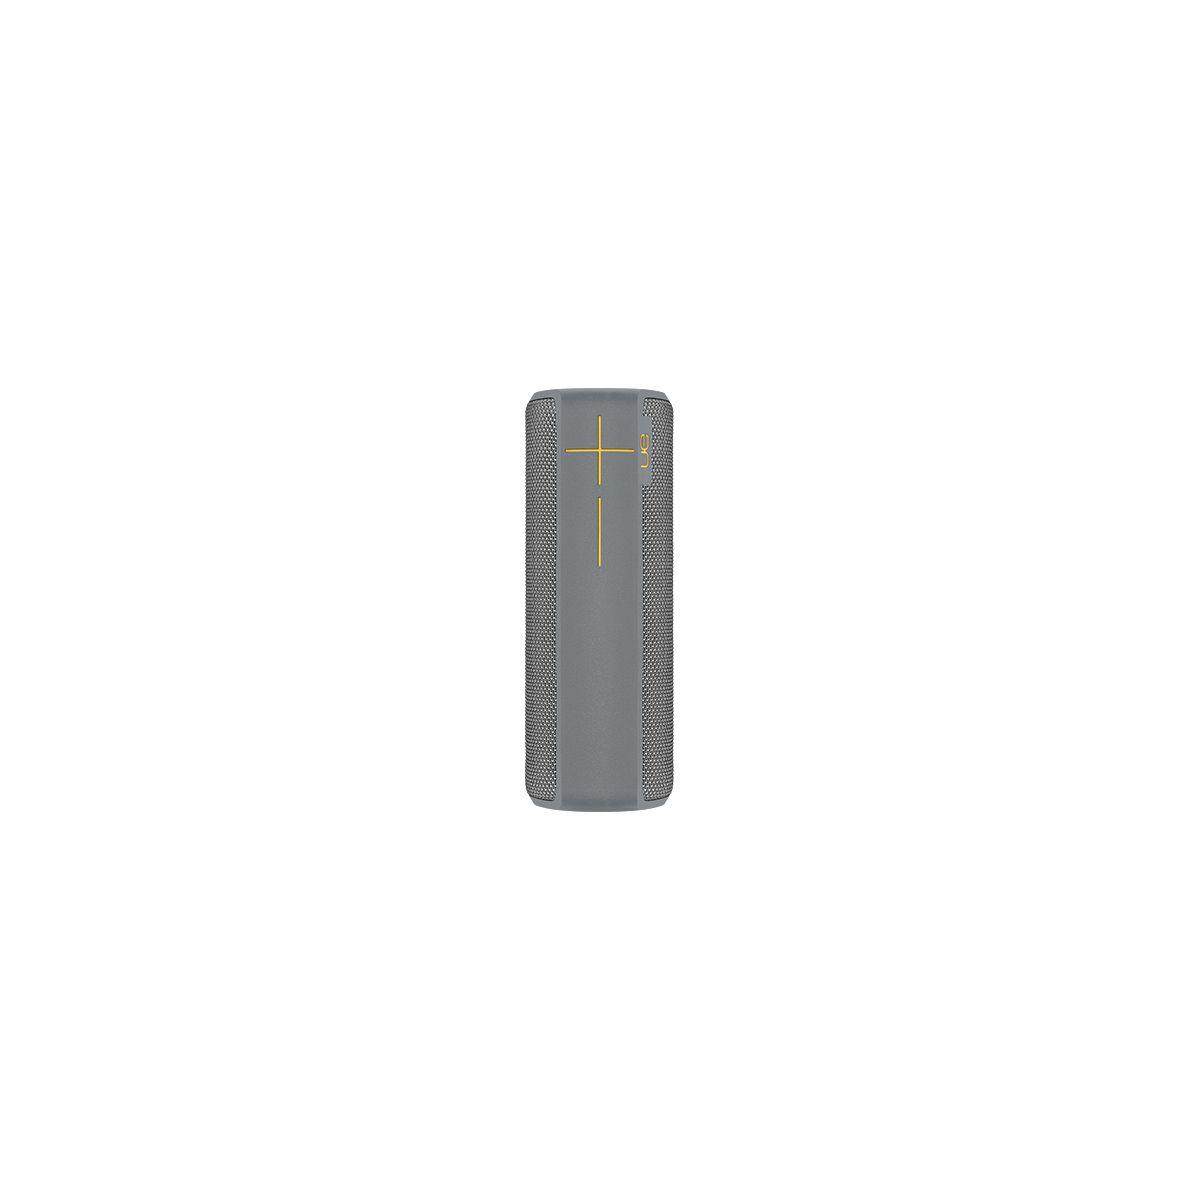 Enceinte Bluetooth ULTIMATE EARS UE BOOM 2 Stone